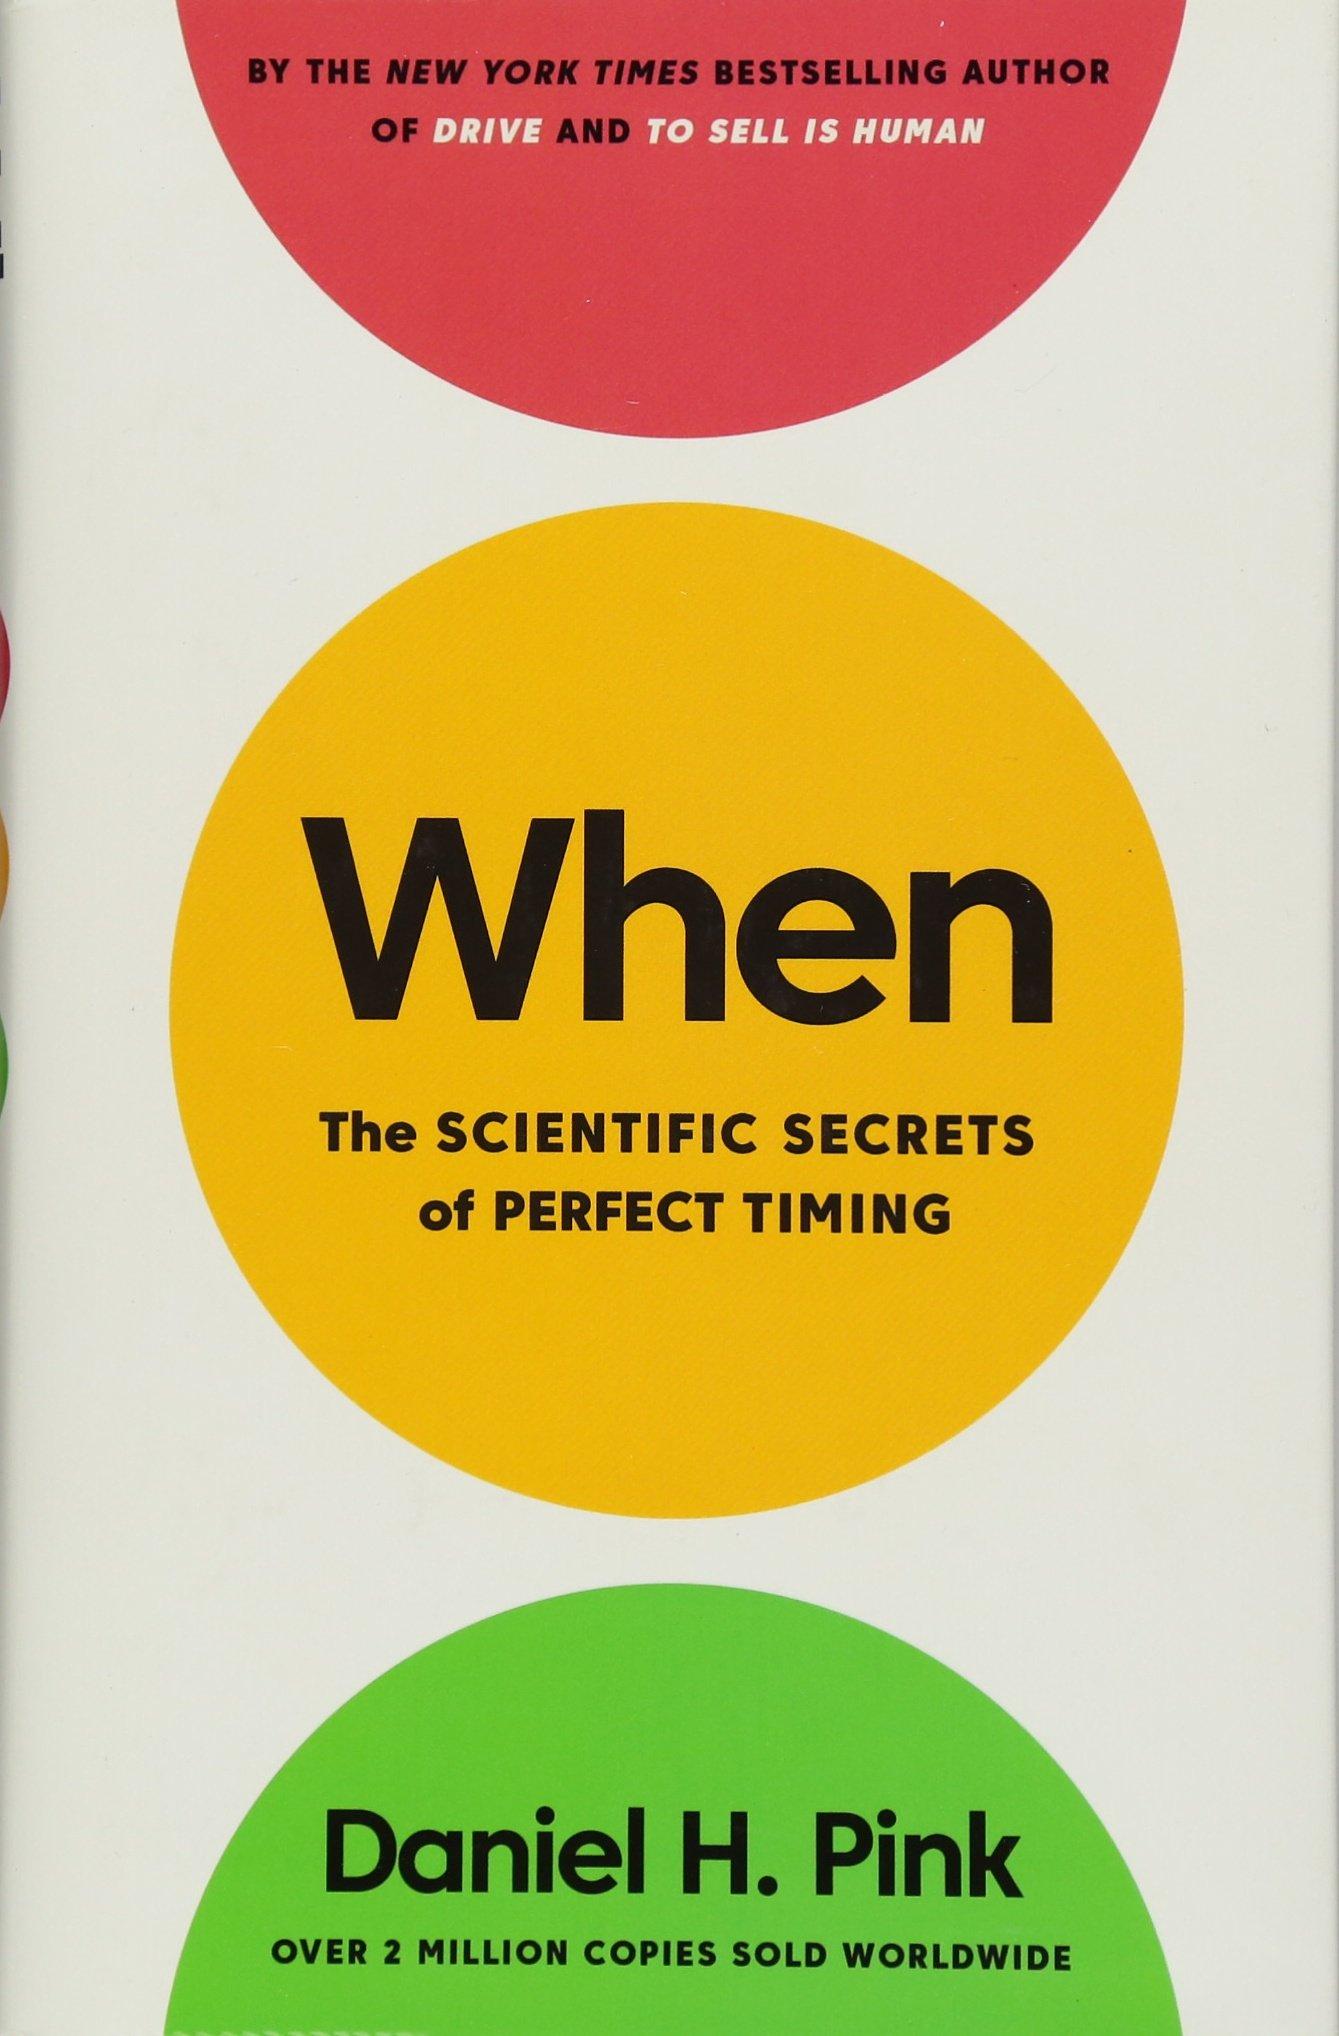 #369: When — The Scientific Secrets of Perfect Timing